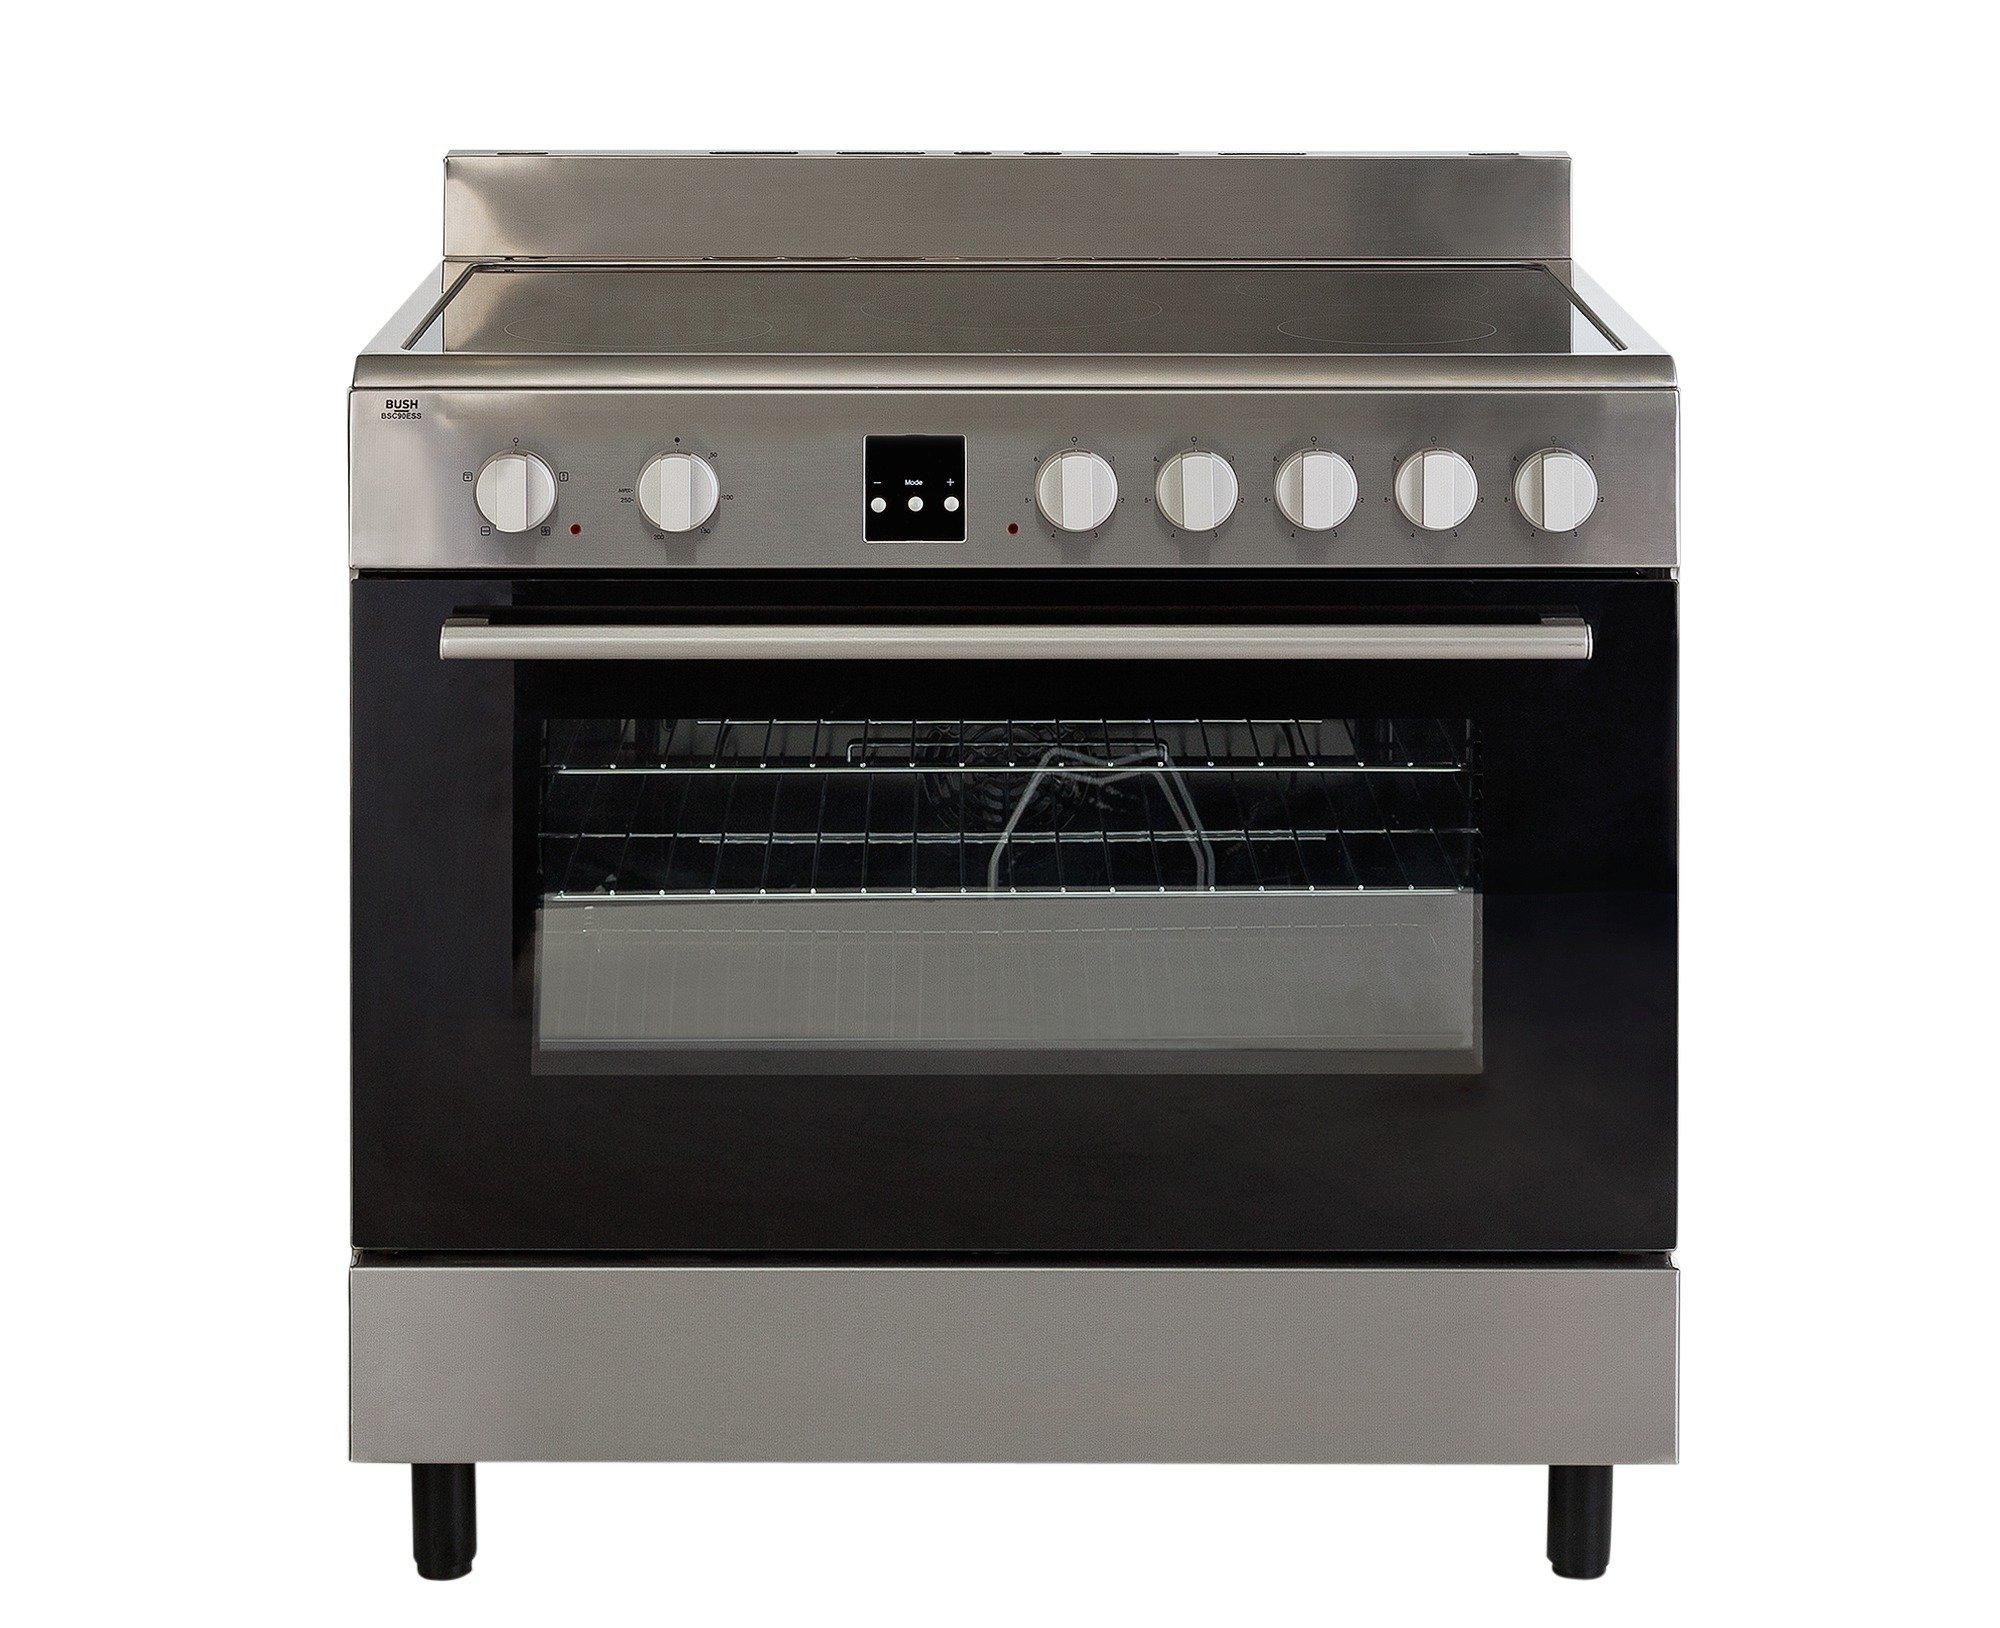 bush bsc90ess electric range cooker stainless steel 429. Black Bedroom Furniture Sets. Home Design Ideas